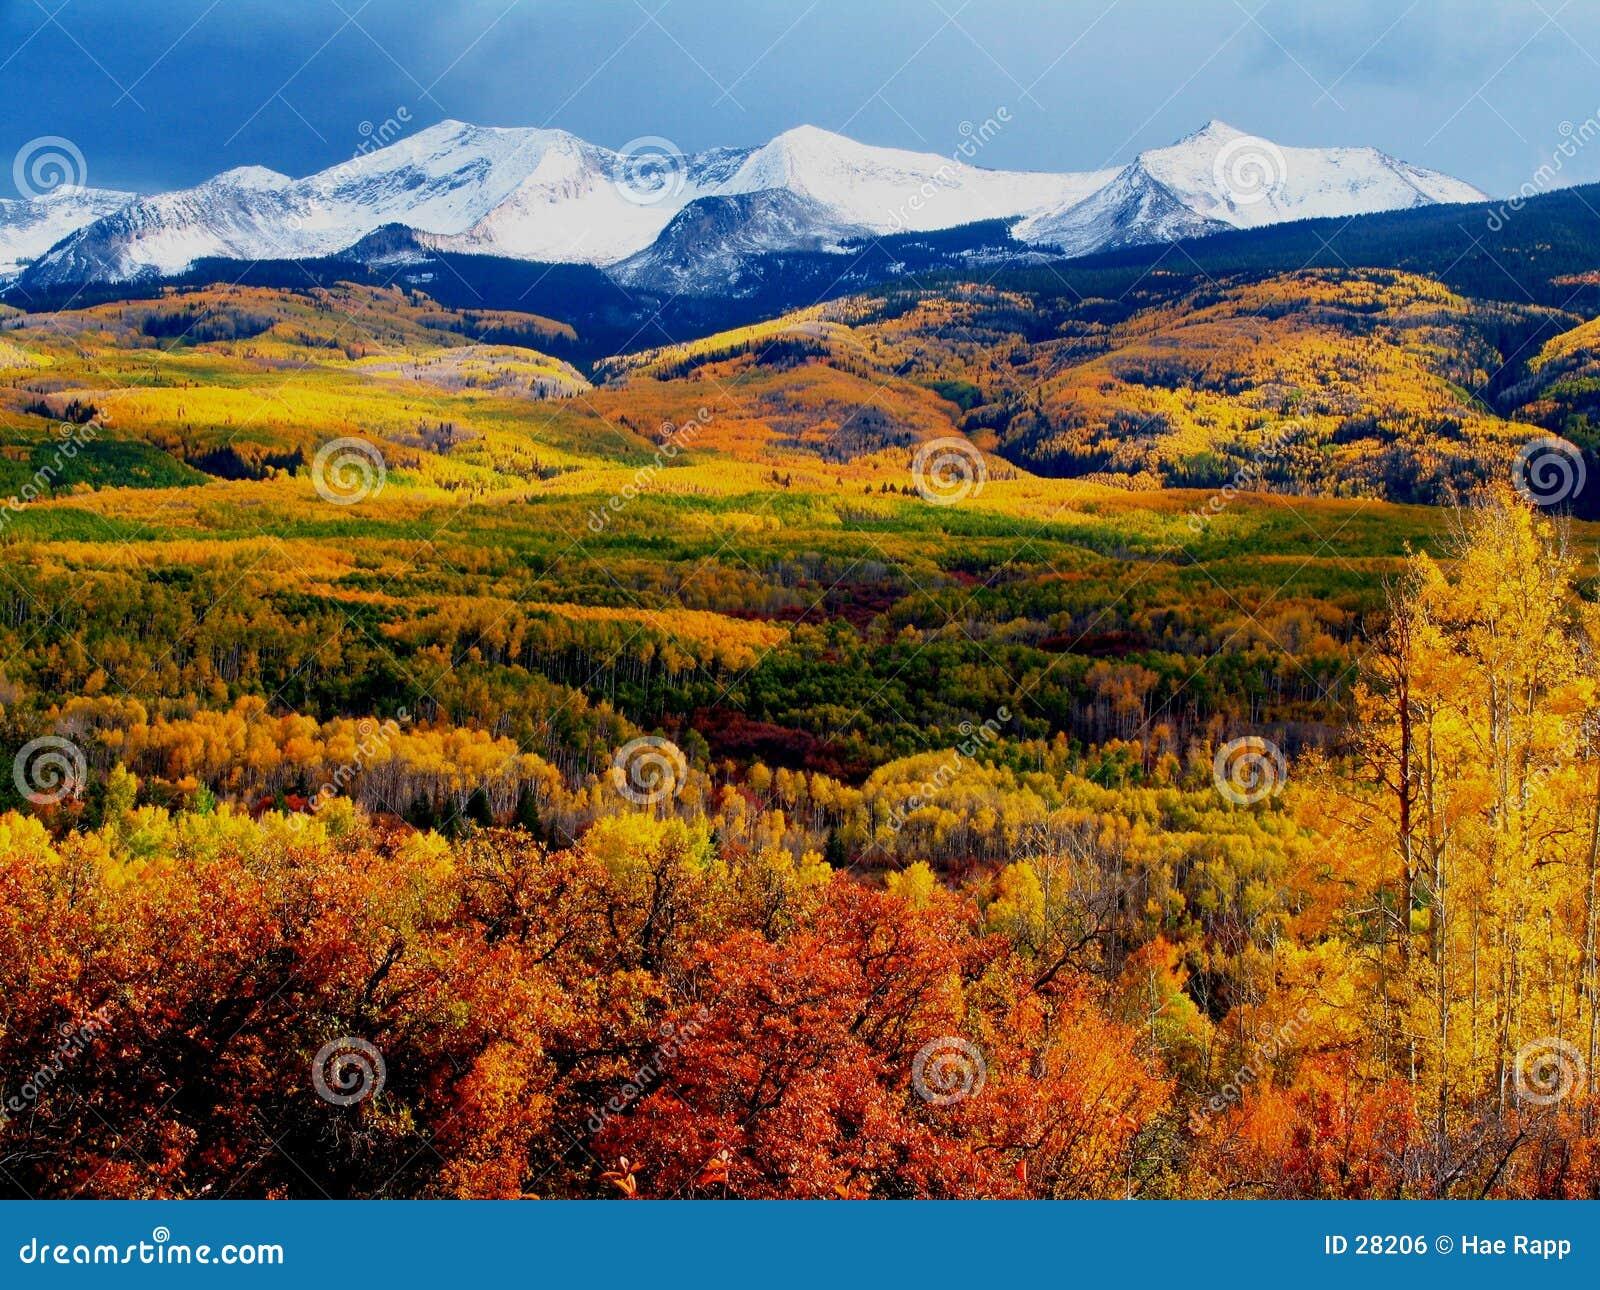 fall mountains royalty free stock image image 28206 Free Clip Art lake clip art free images